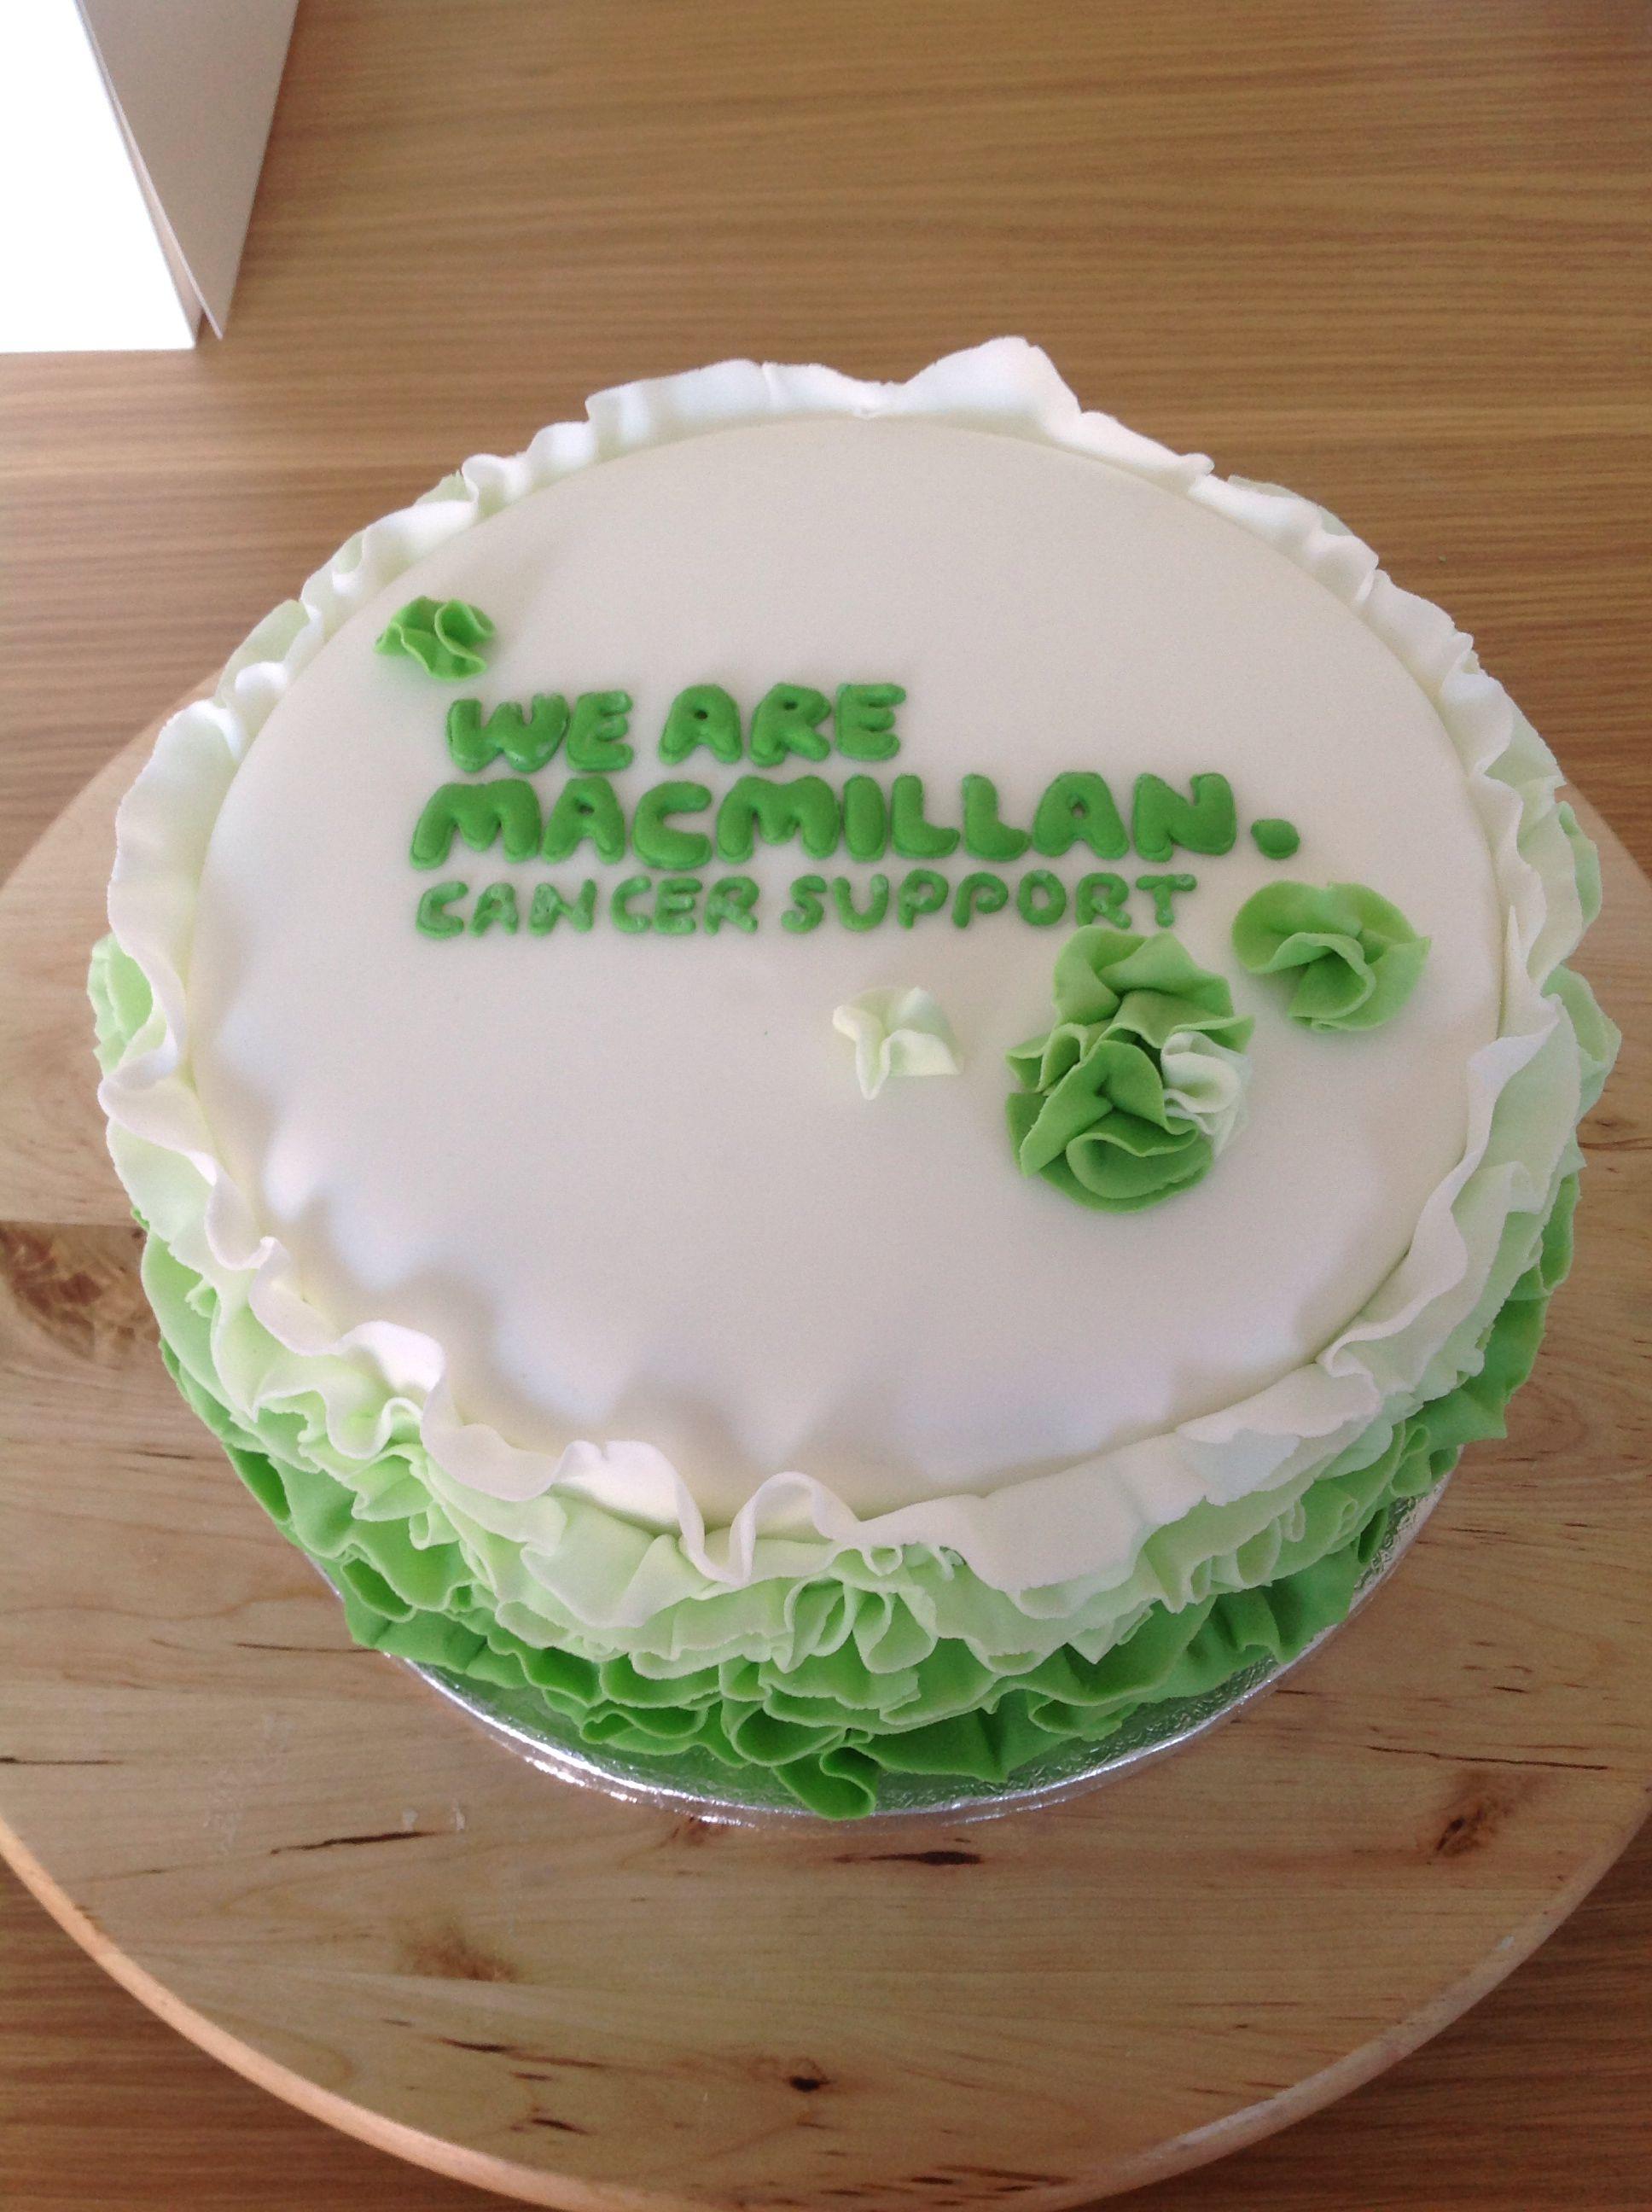 Charity Raffle Cake